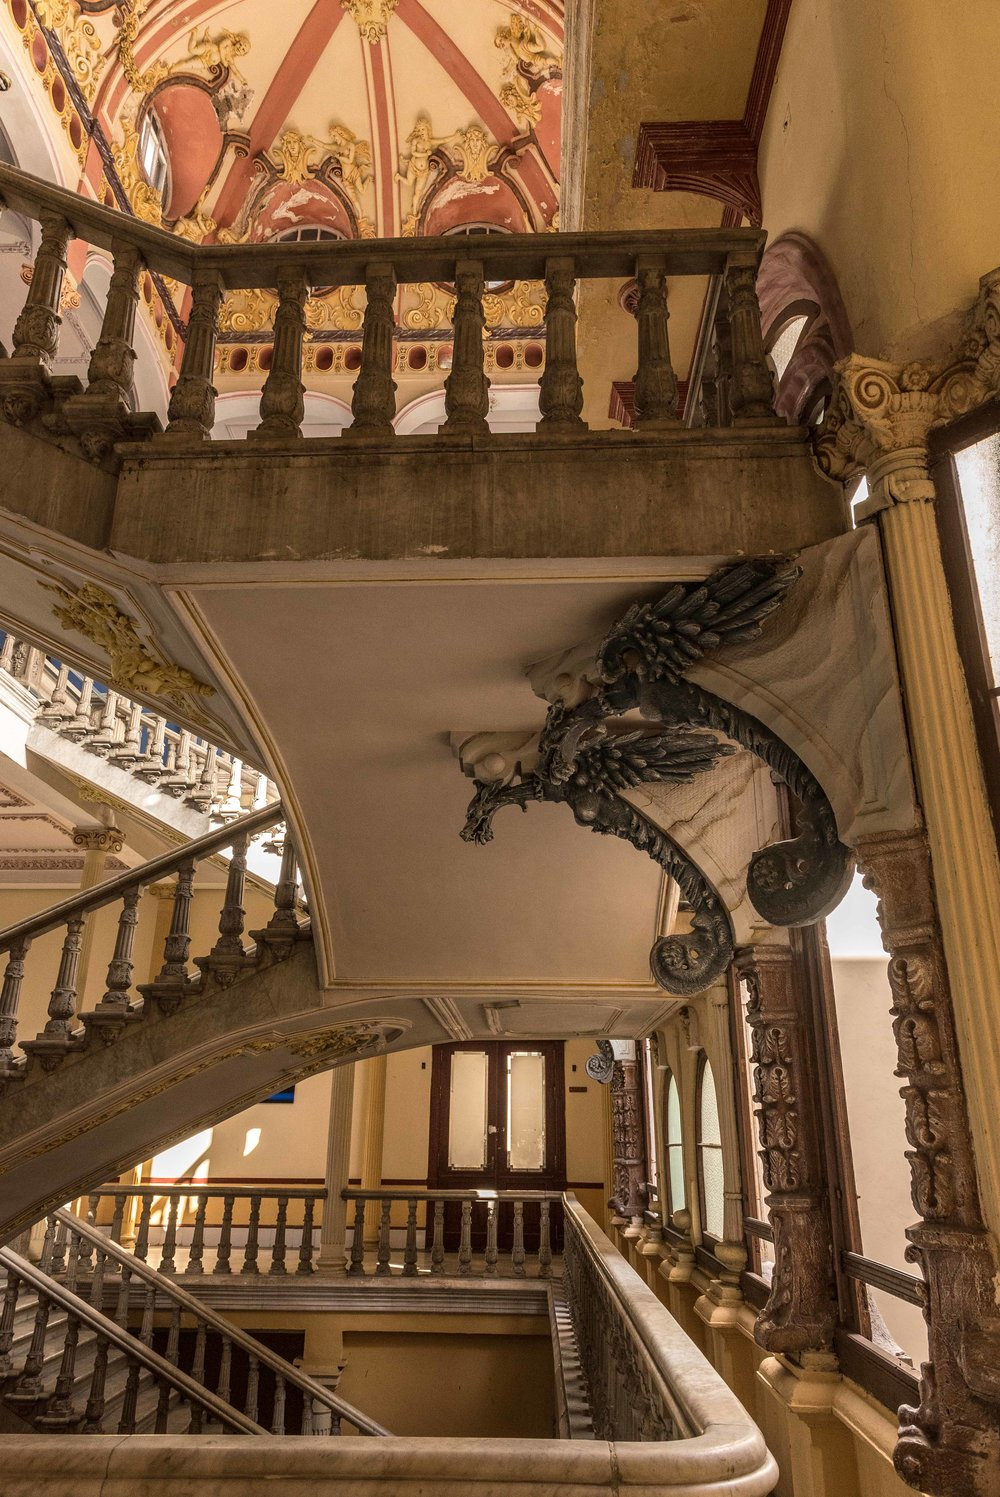 cuba-havana-ballet-school-staircase.jpg